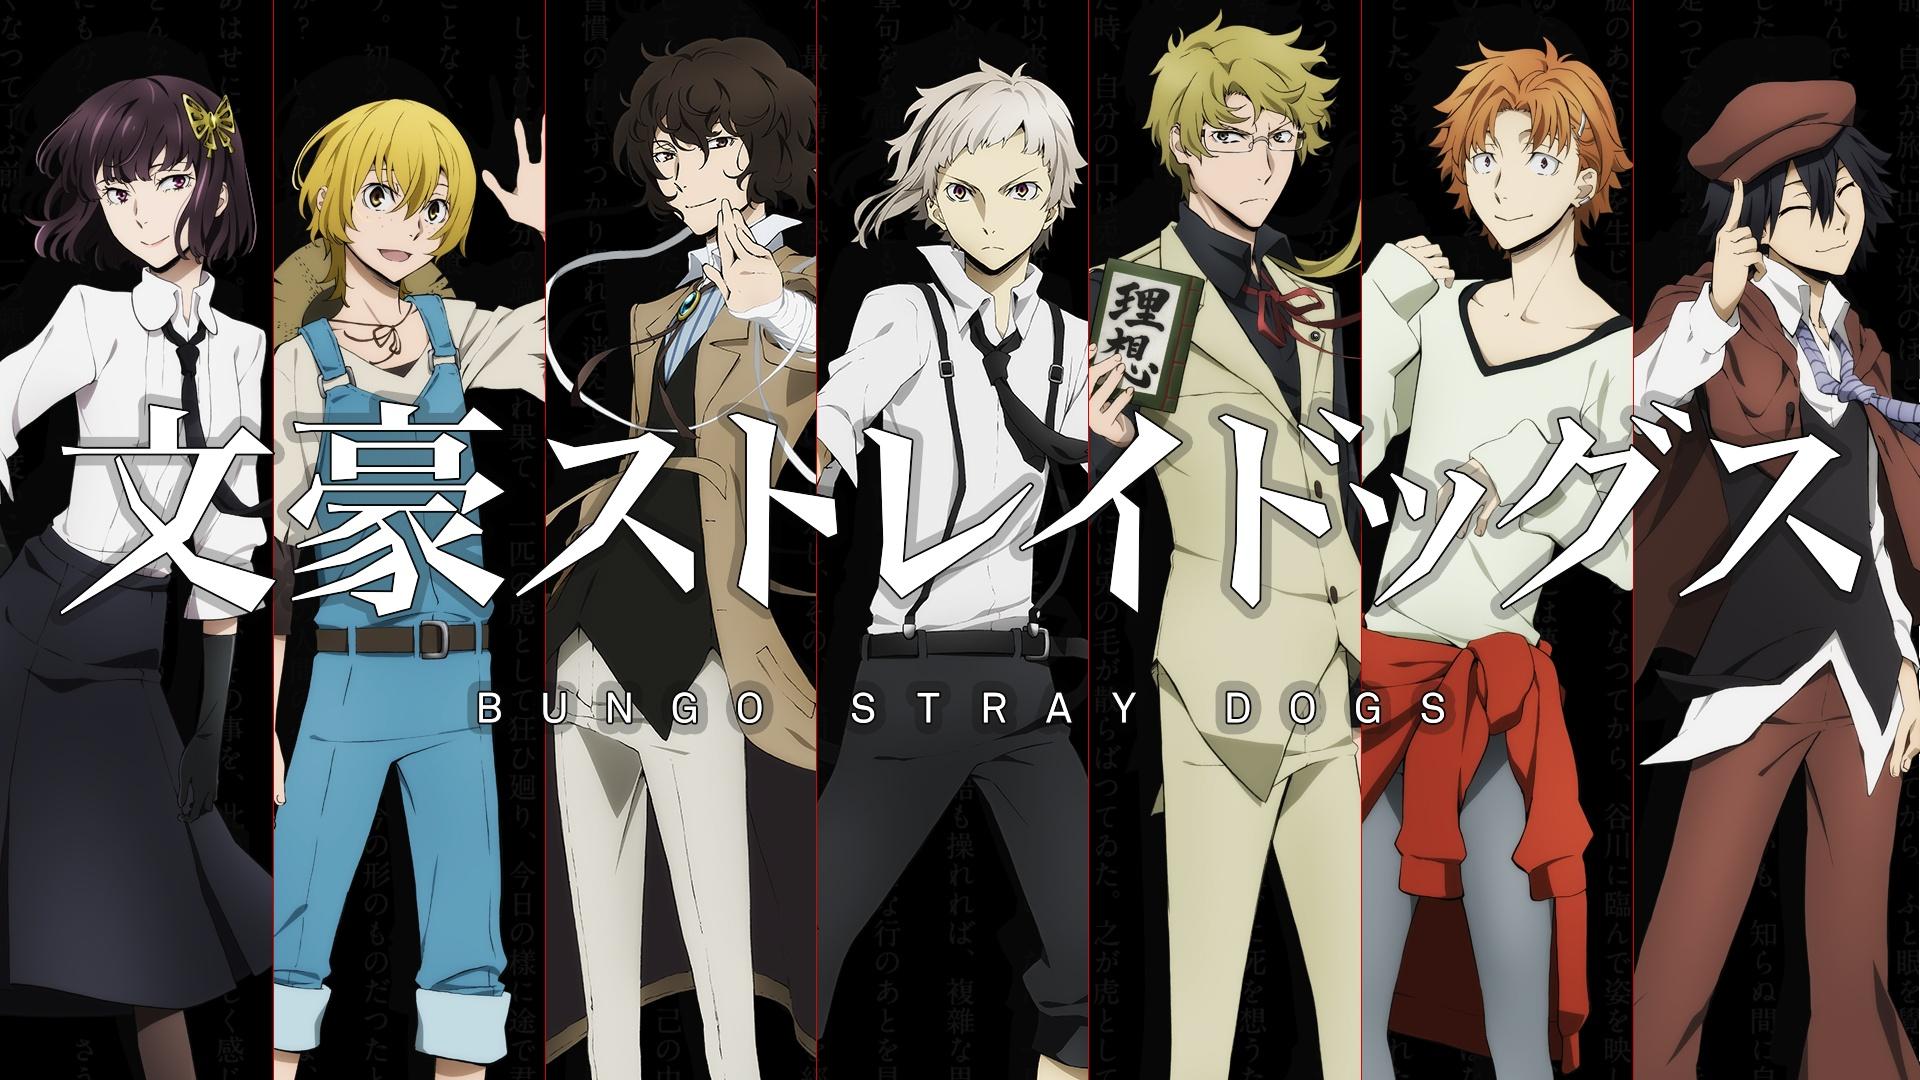 bungo-stray-dogs-anime